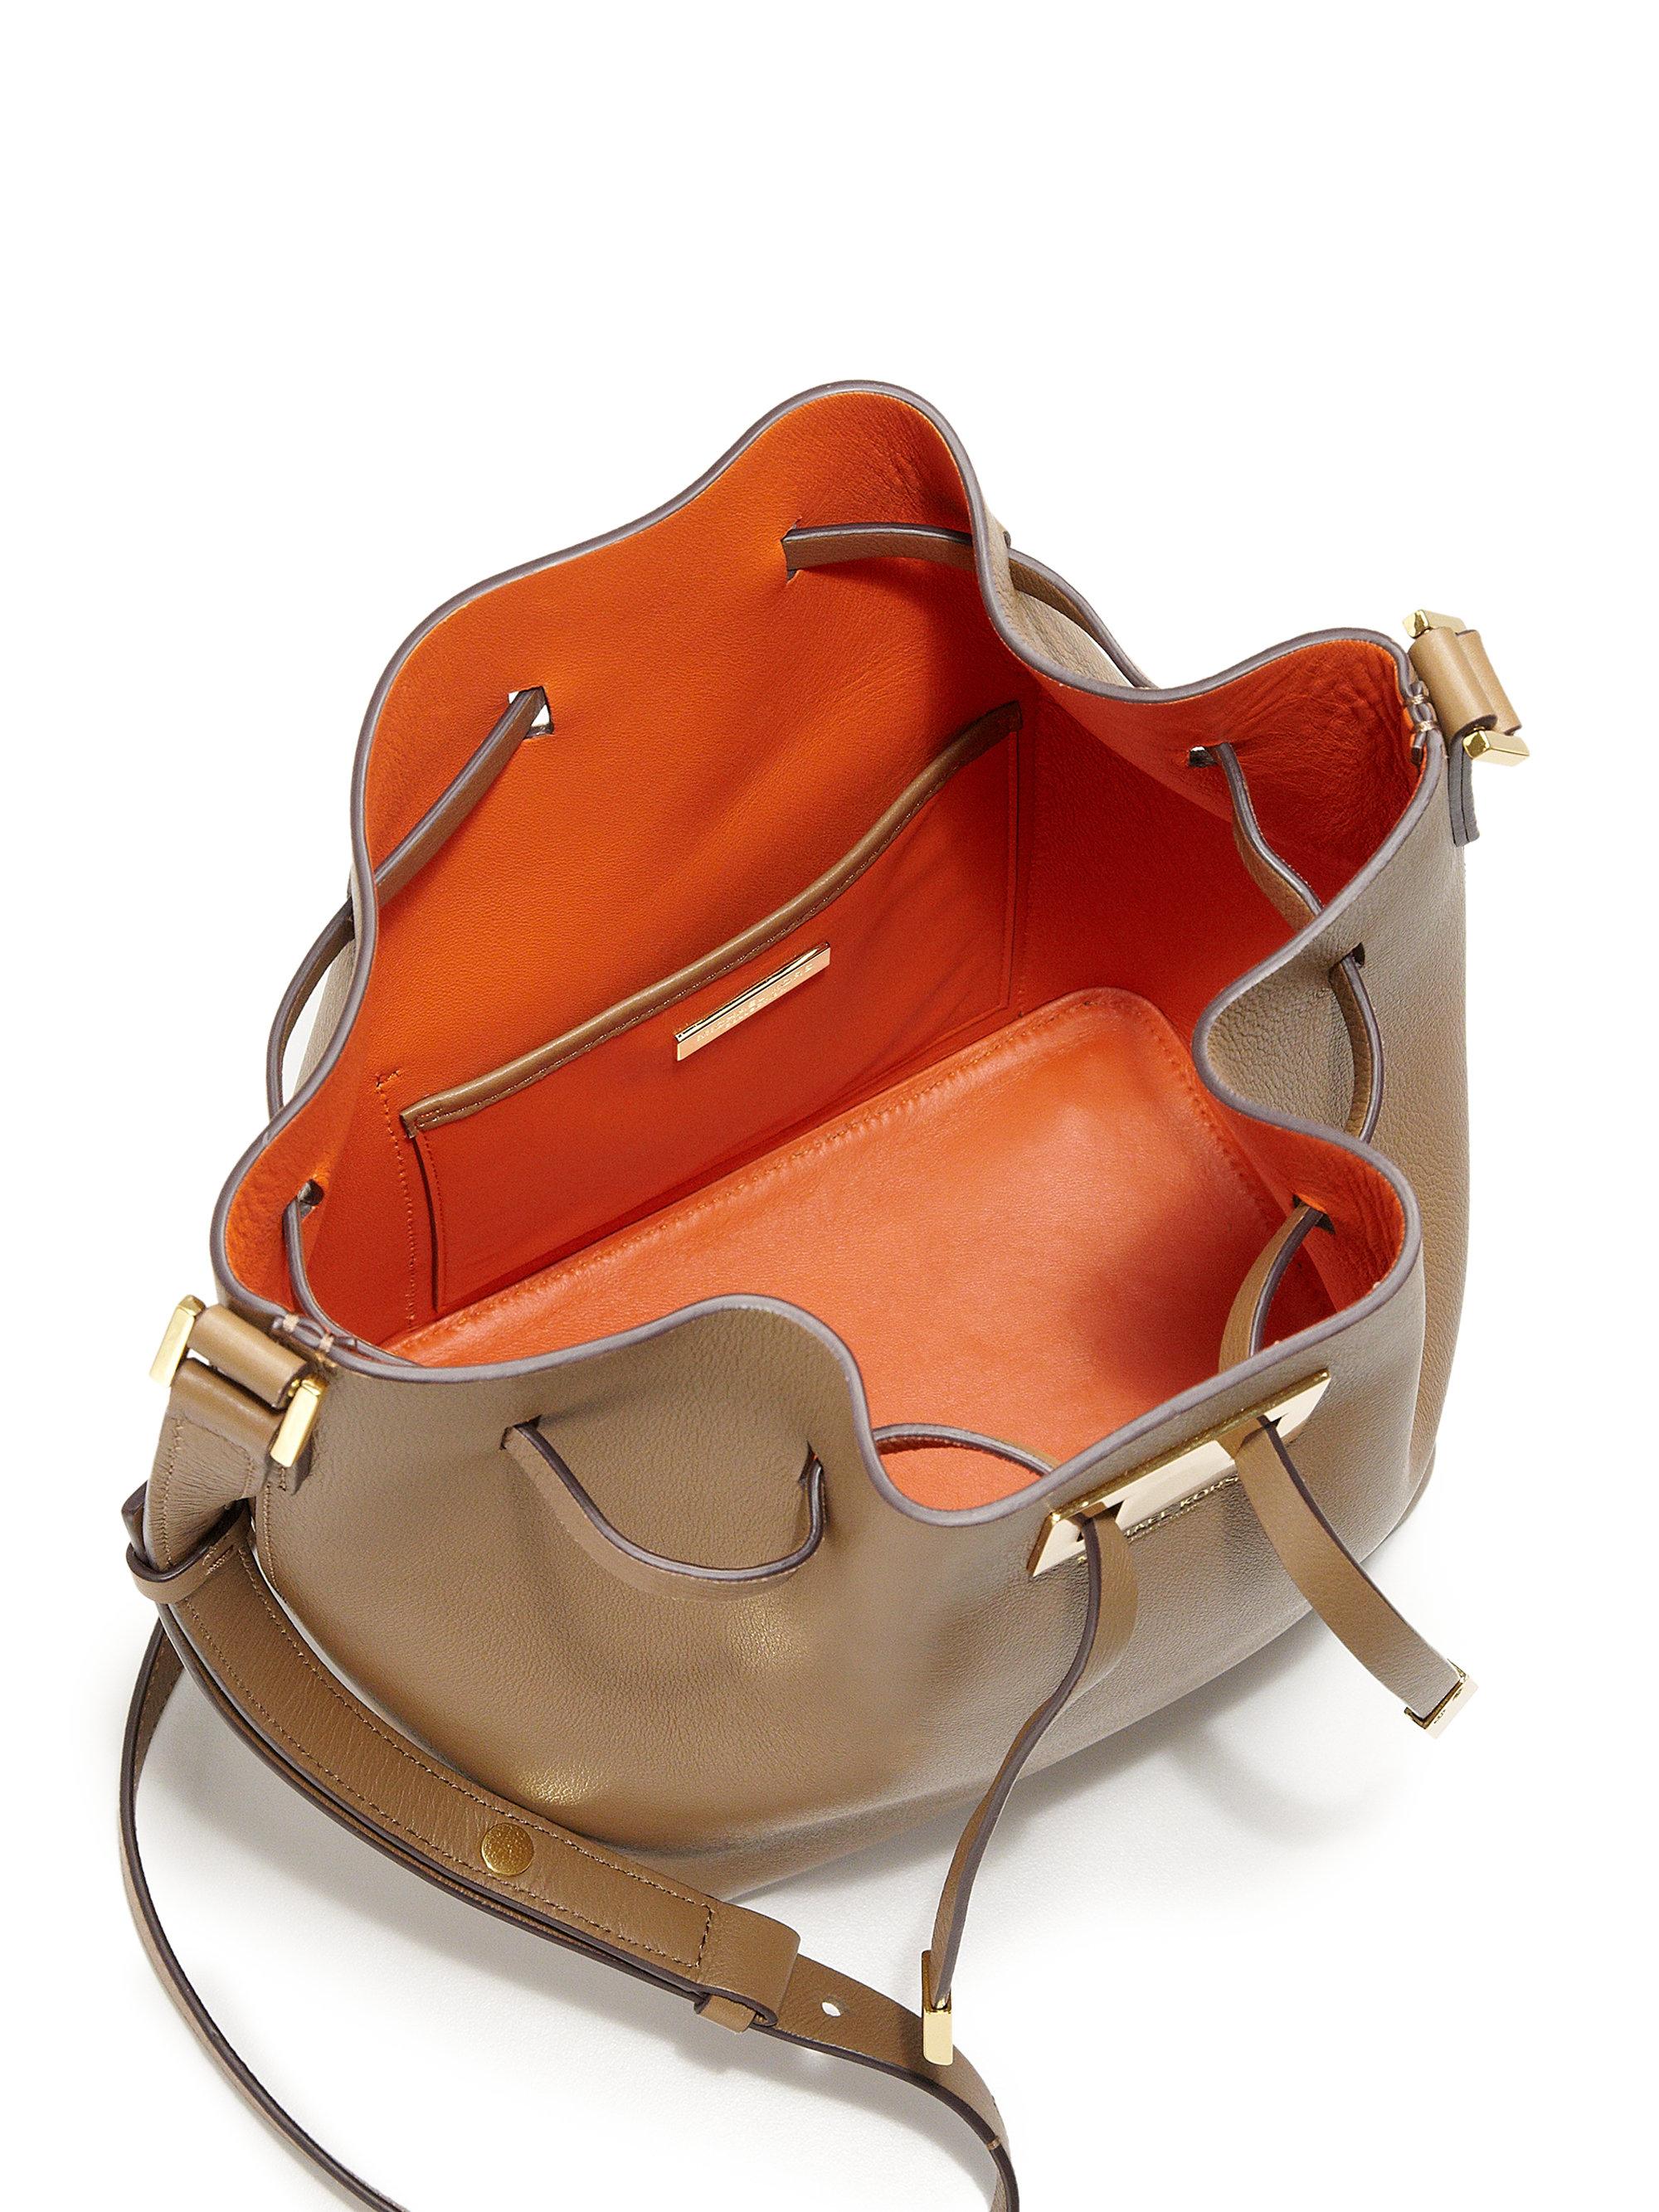 a0d3abb63e9f7e ... Messenger Desert Clemi Michael kors Miranda Medium Leather Bucket Bag  in Natural ...